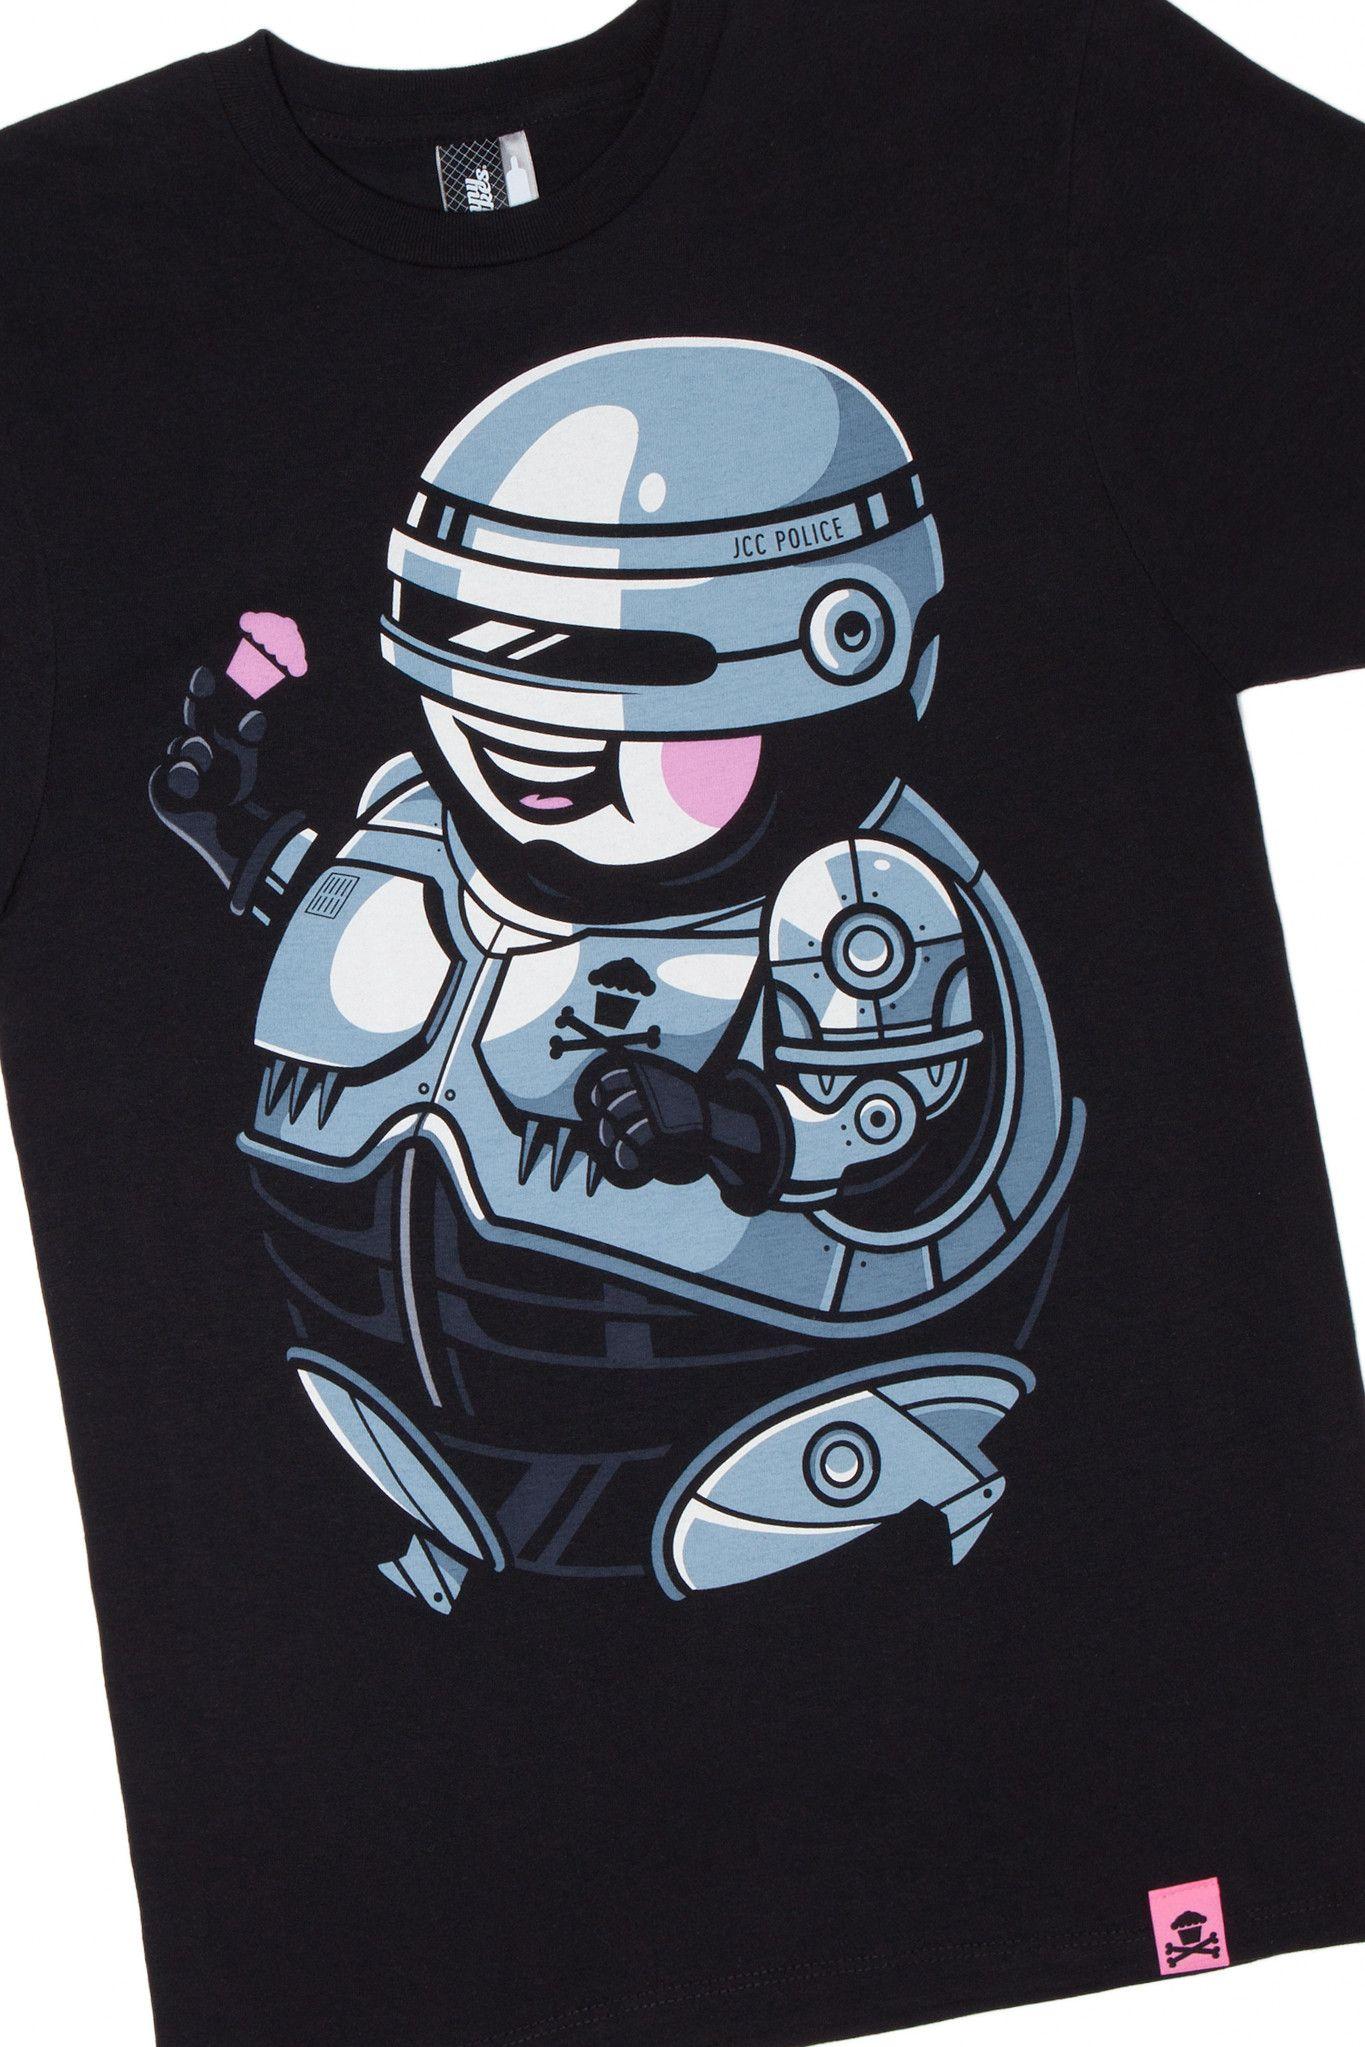 T-shirt design zeixs - Johnny Cupcakes Got To Love Robocop